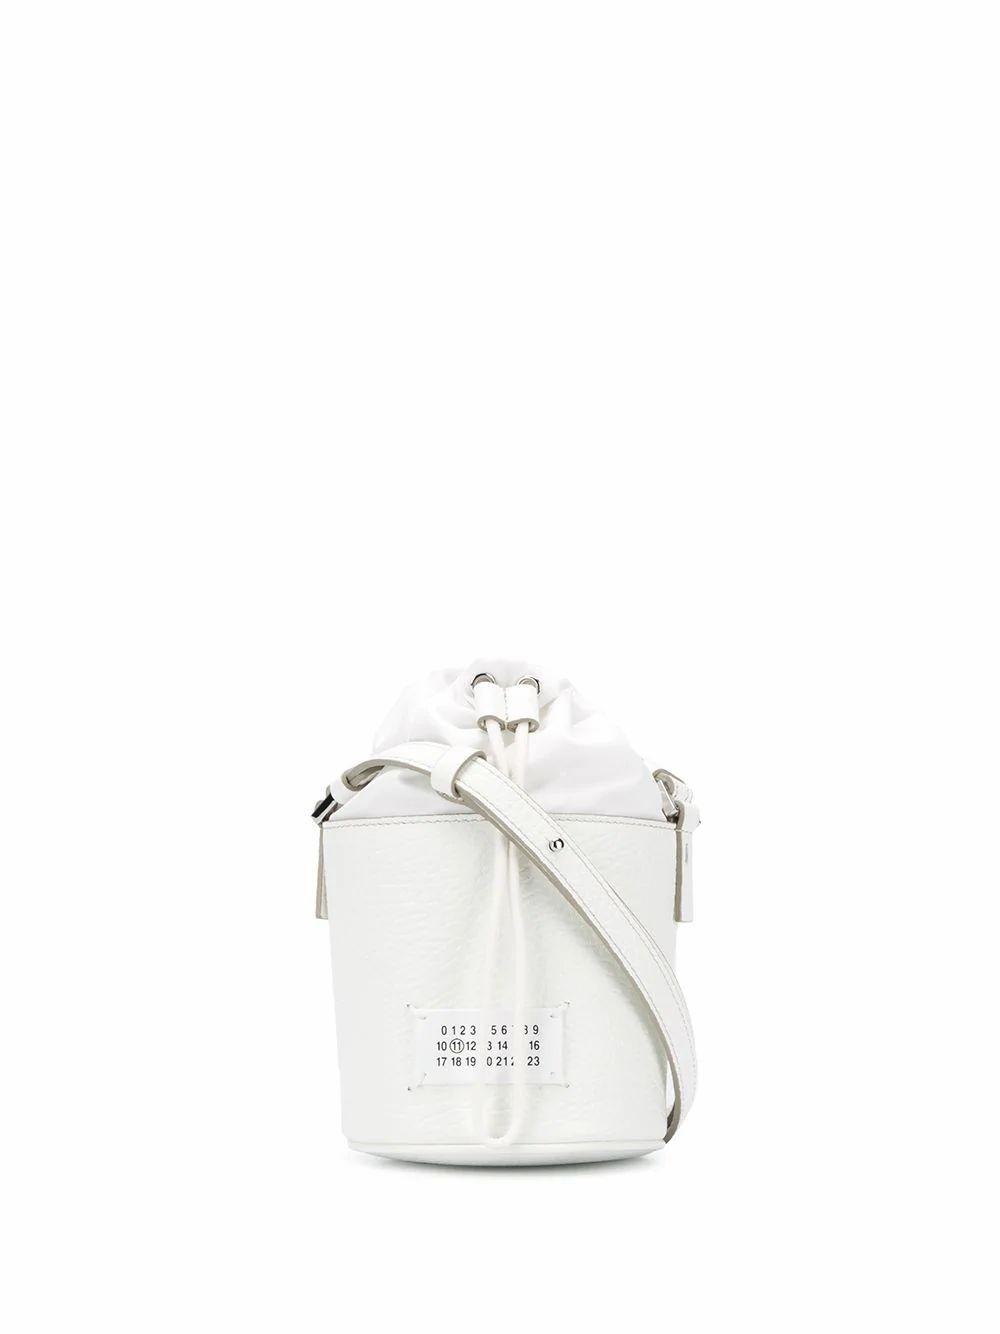 MAISON MARGIELA WOMEN'S S56WG0164P0396H7736 WHITE LEATHER SHOULDER BAG